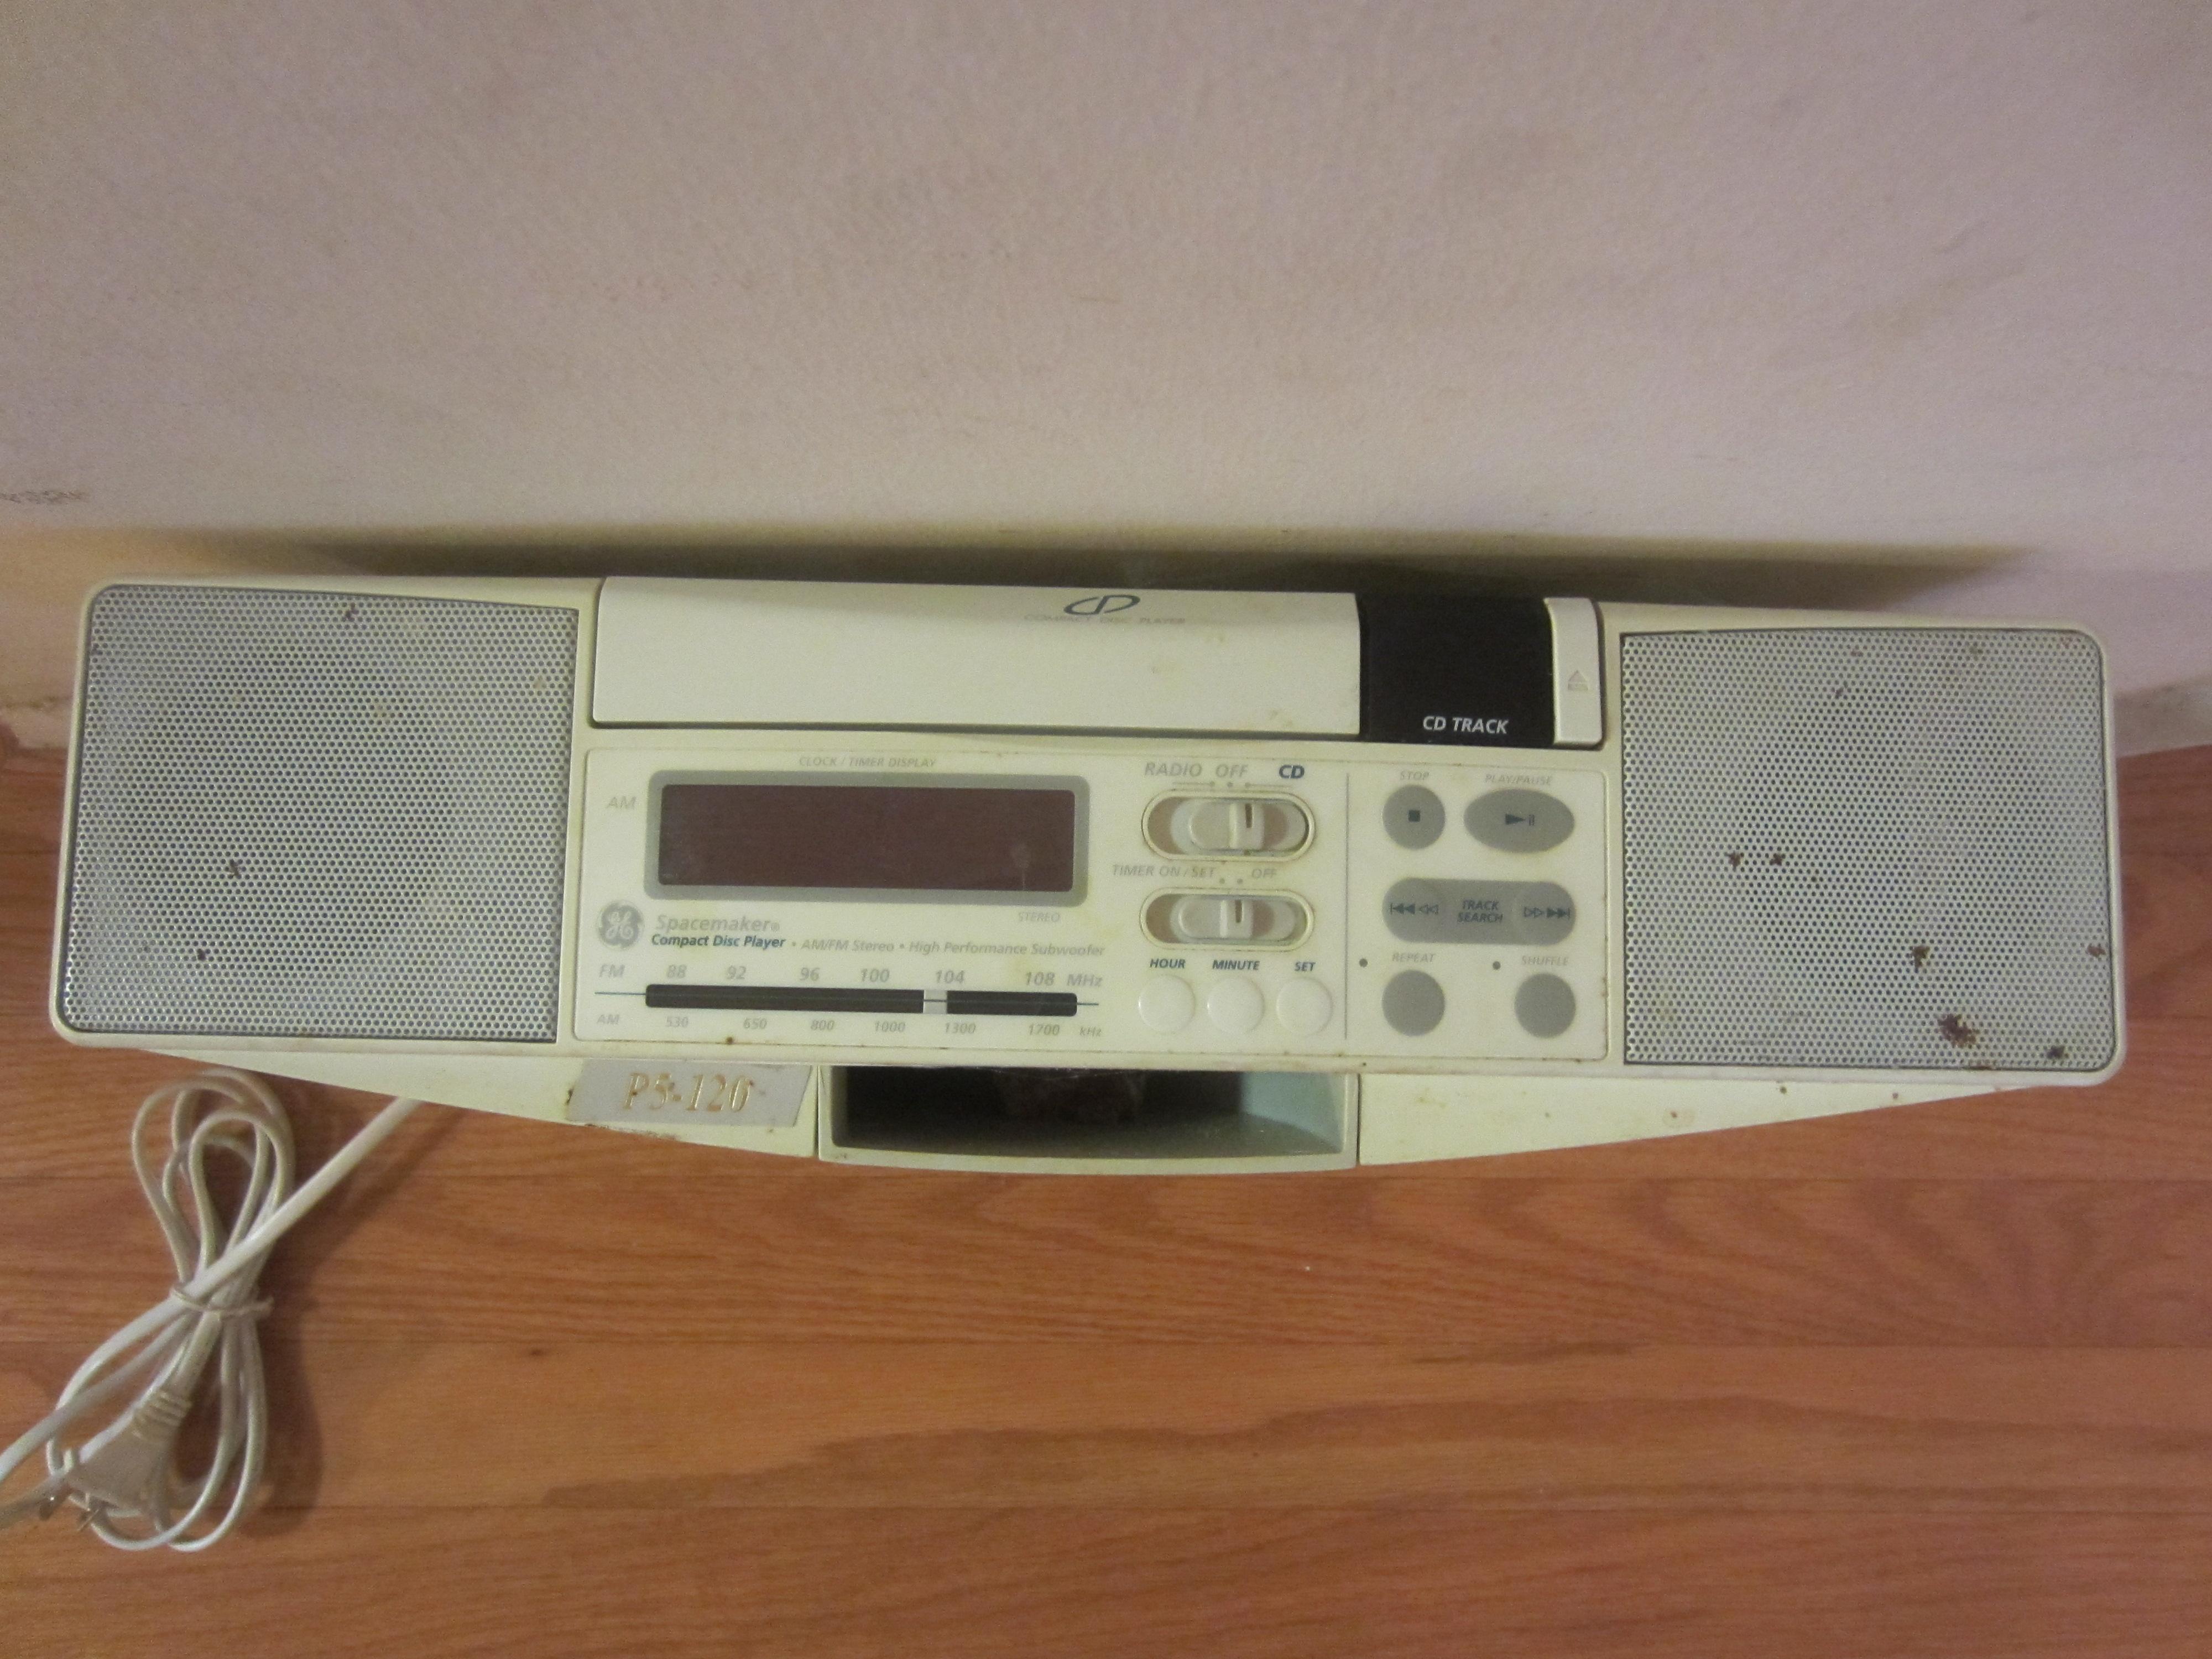 radio for under kitchen cabinets bose kitchen radio under cabinet new interior exterior. Black Bedroom Furniture Sets. Home Design Ideas